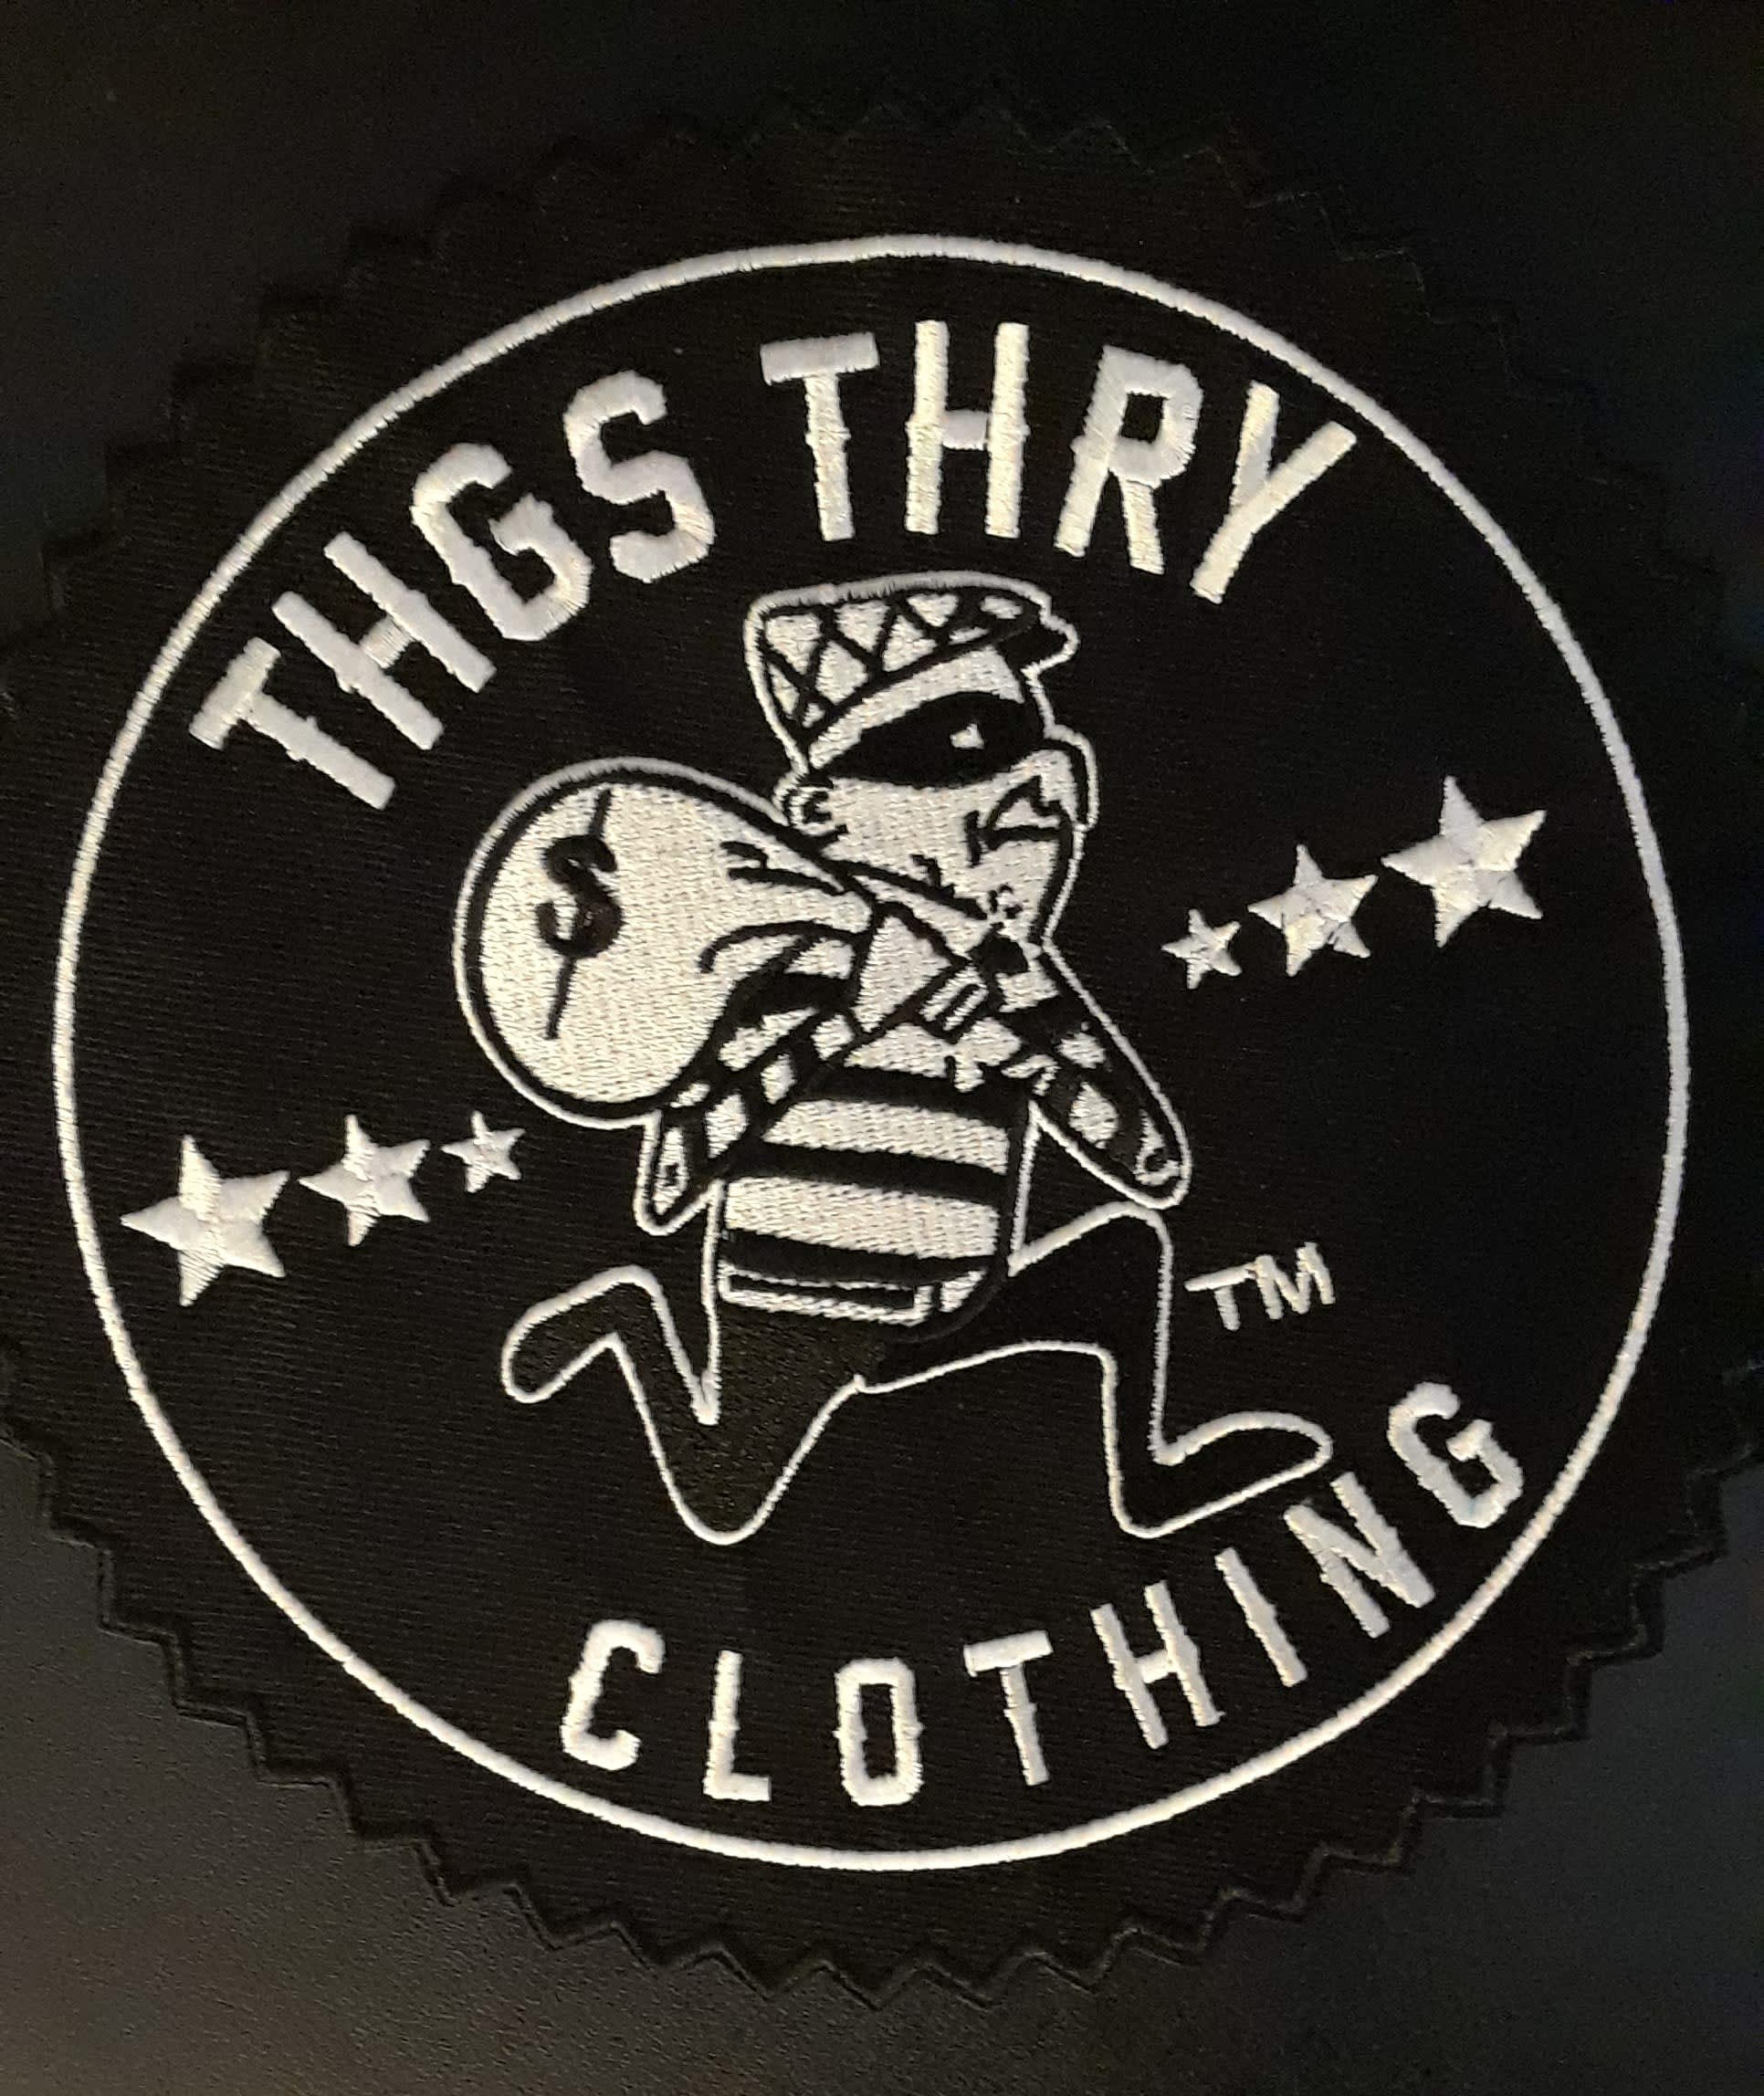 THGS THRY LLC.